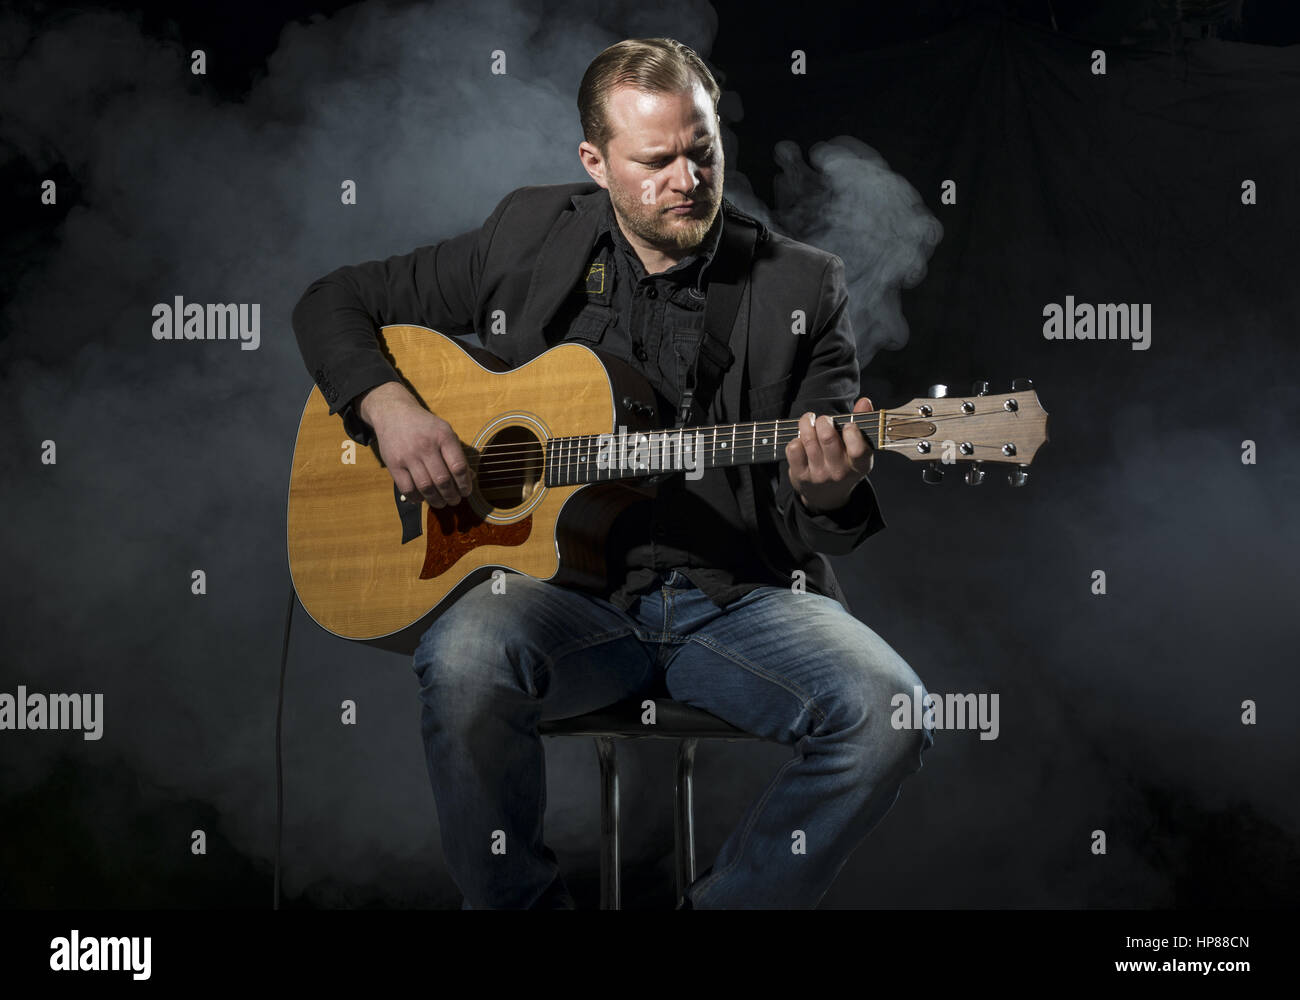 Musiker Spielt Auf Akkustischer Gitarre (Model-Release) Stockbild